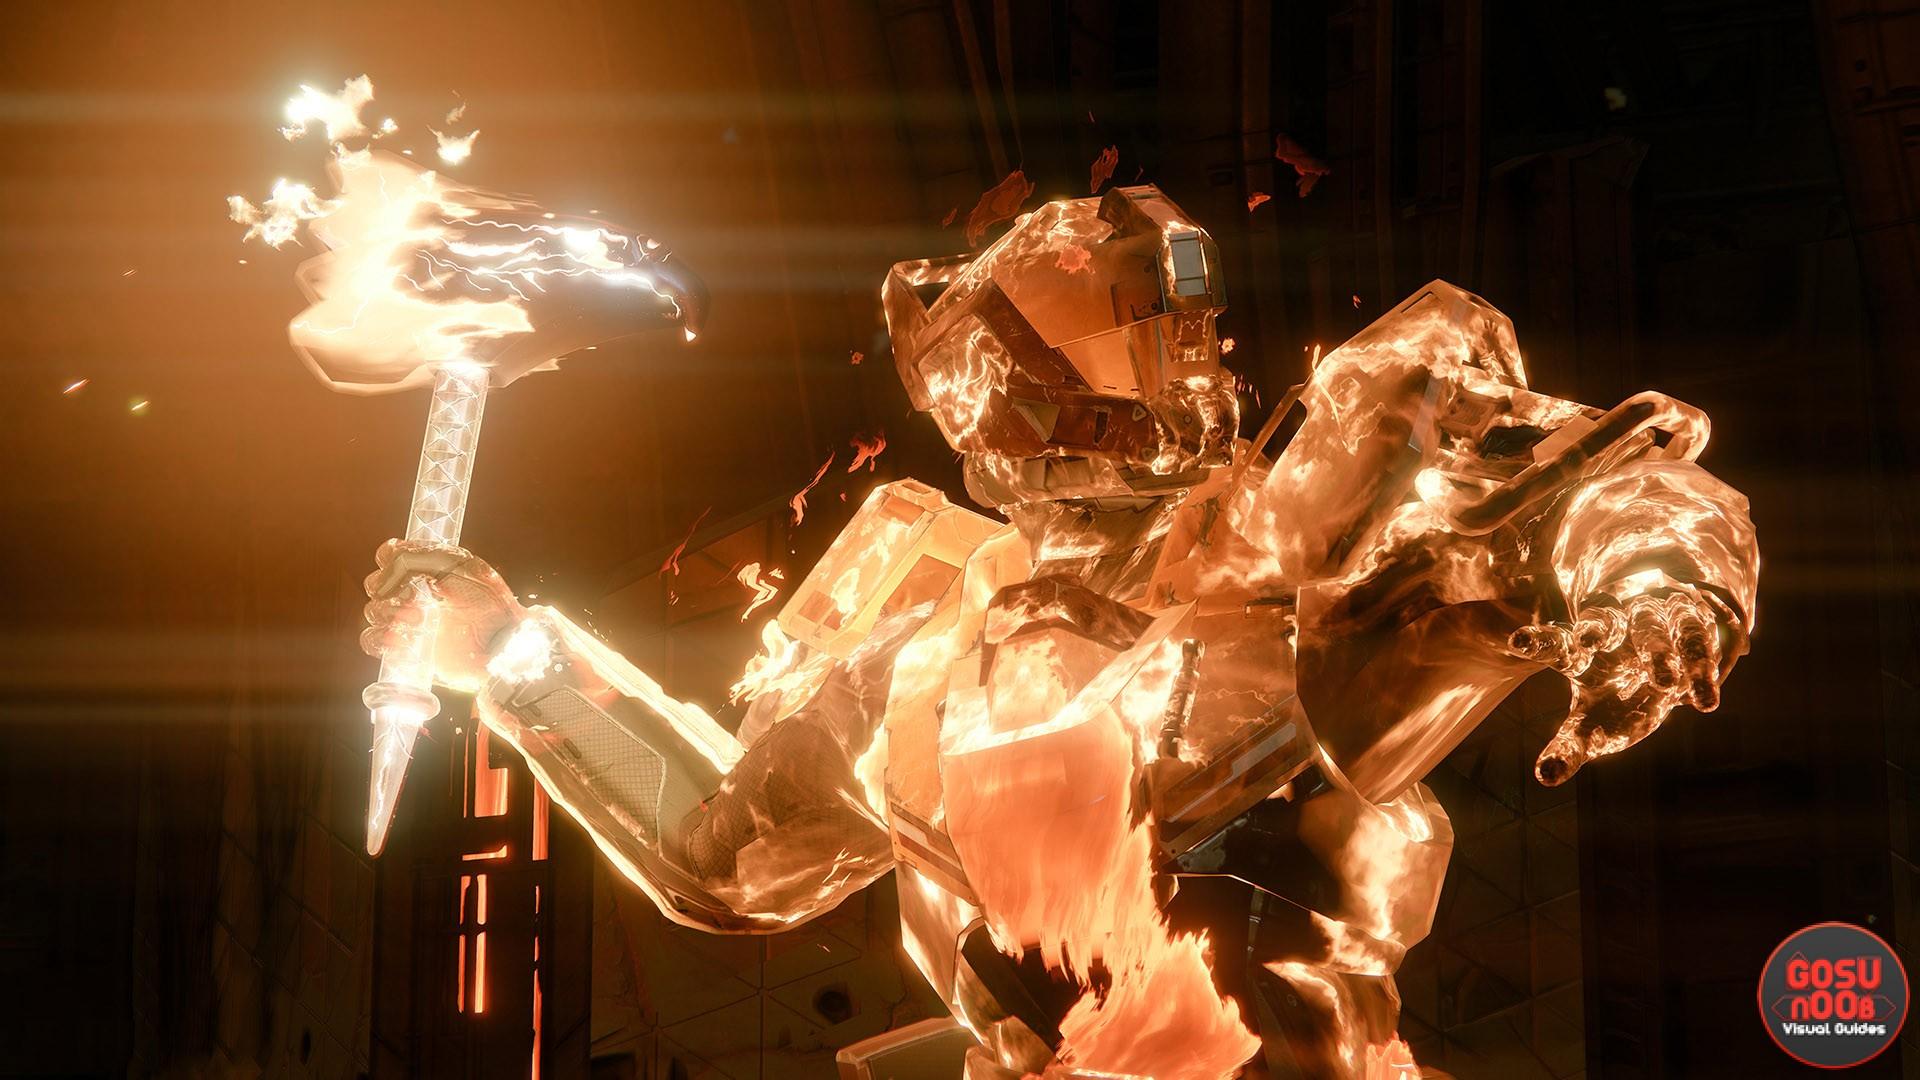 Destiny The Taken King Wallpaper: How To Unlock Sunbreaker